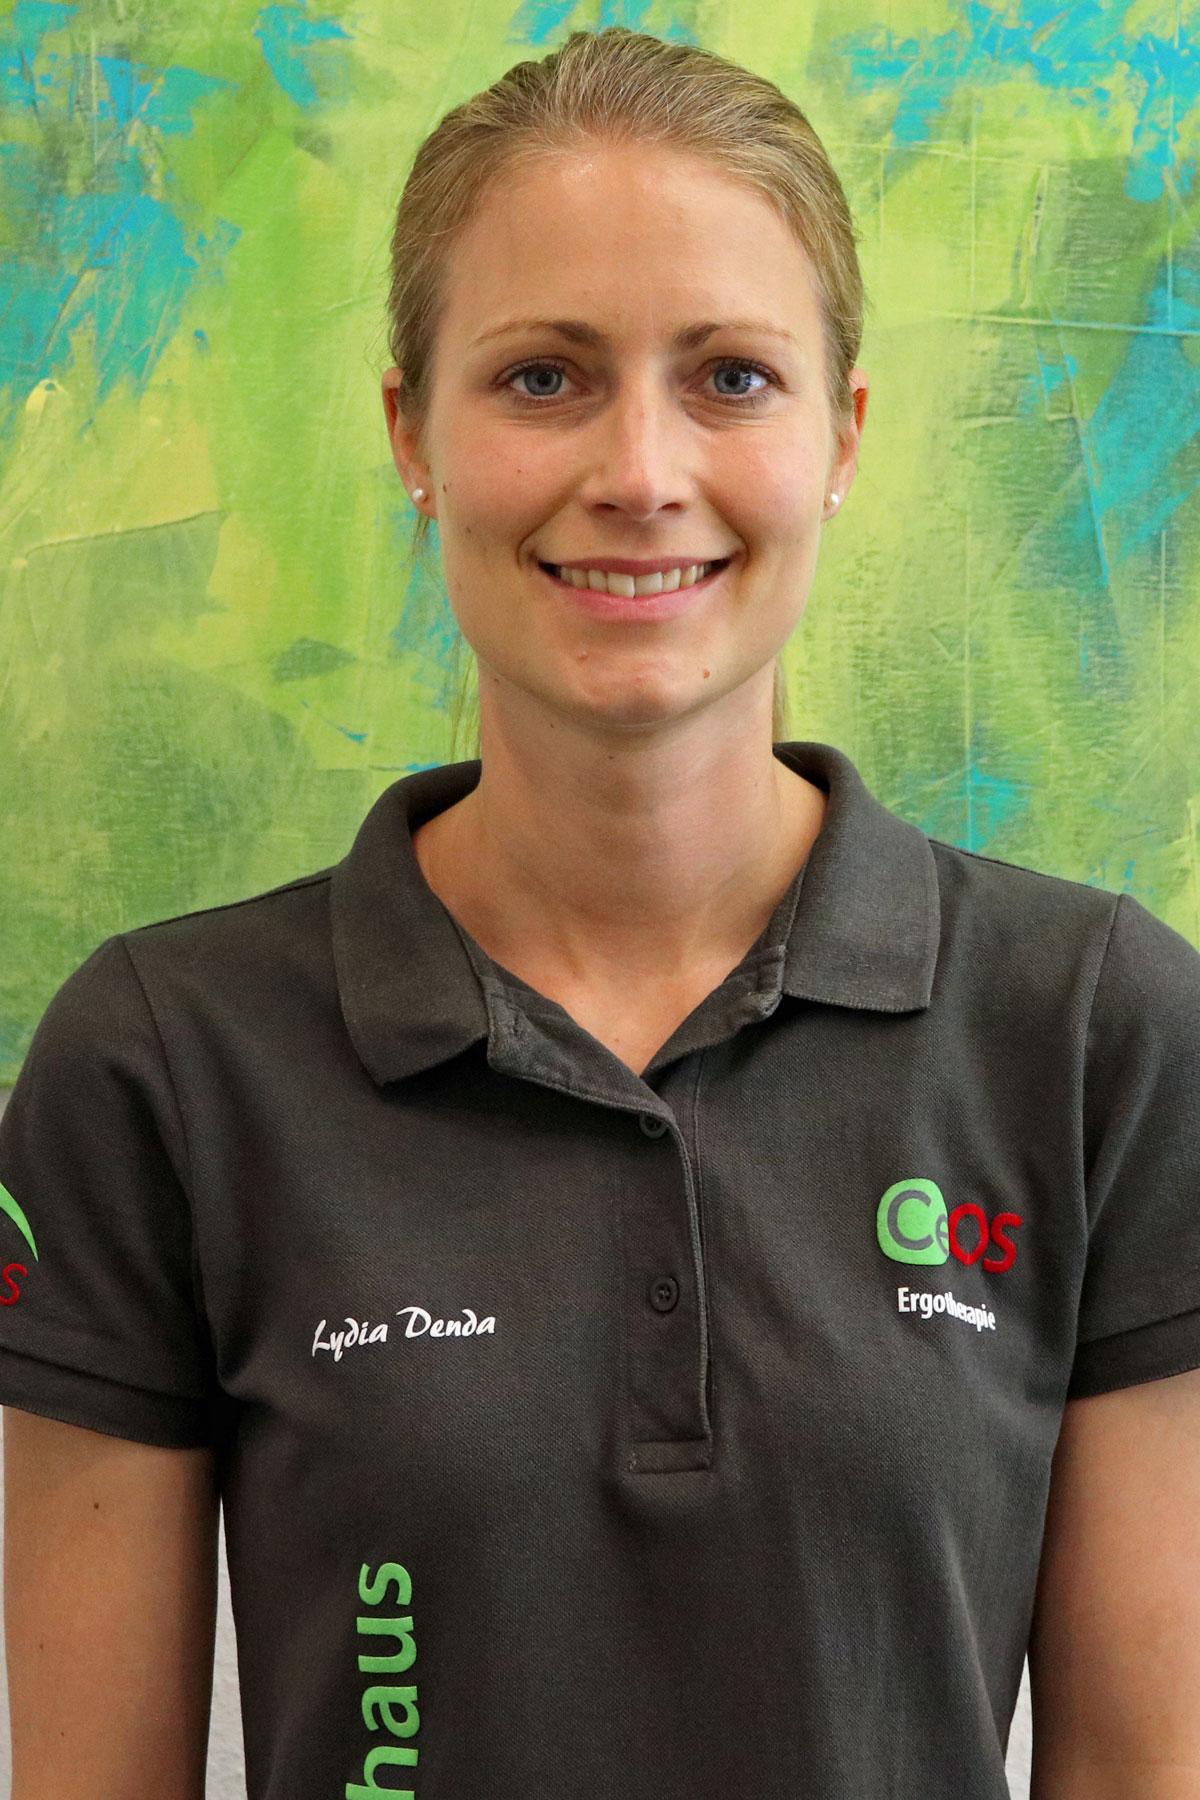 Lydia Denda